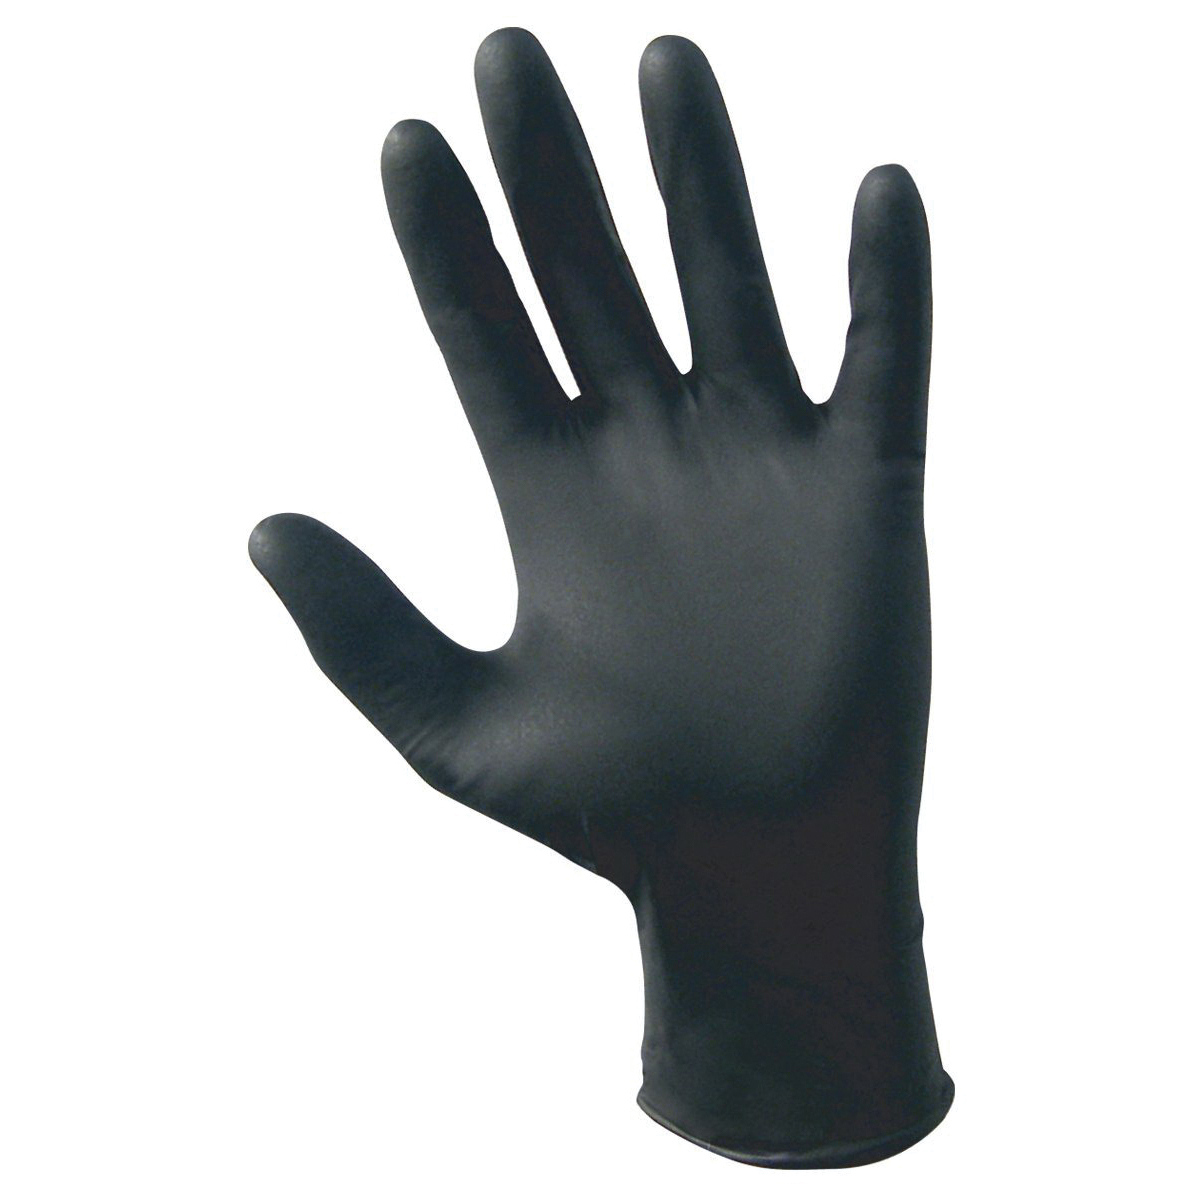 SAS RAVEN® Nitrile Exam Gloves, Black 6 mil Powder Free, 100/bx